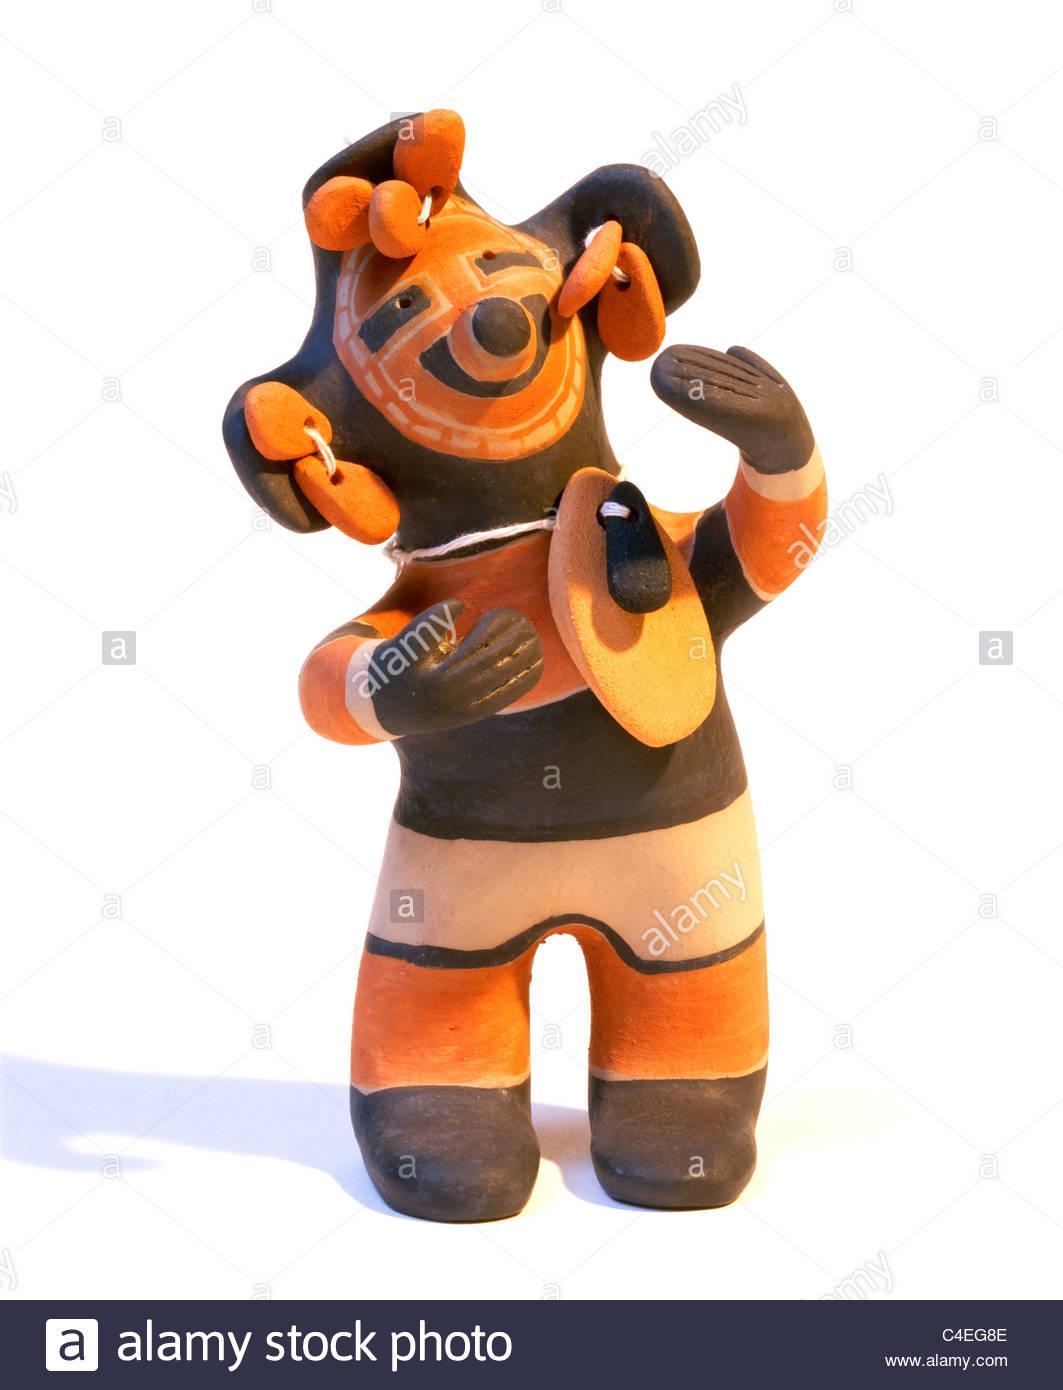 cochiti pueblo indian clay figurine made by